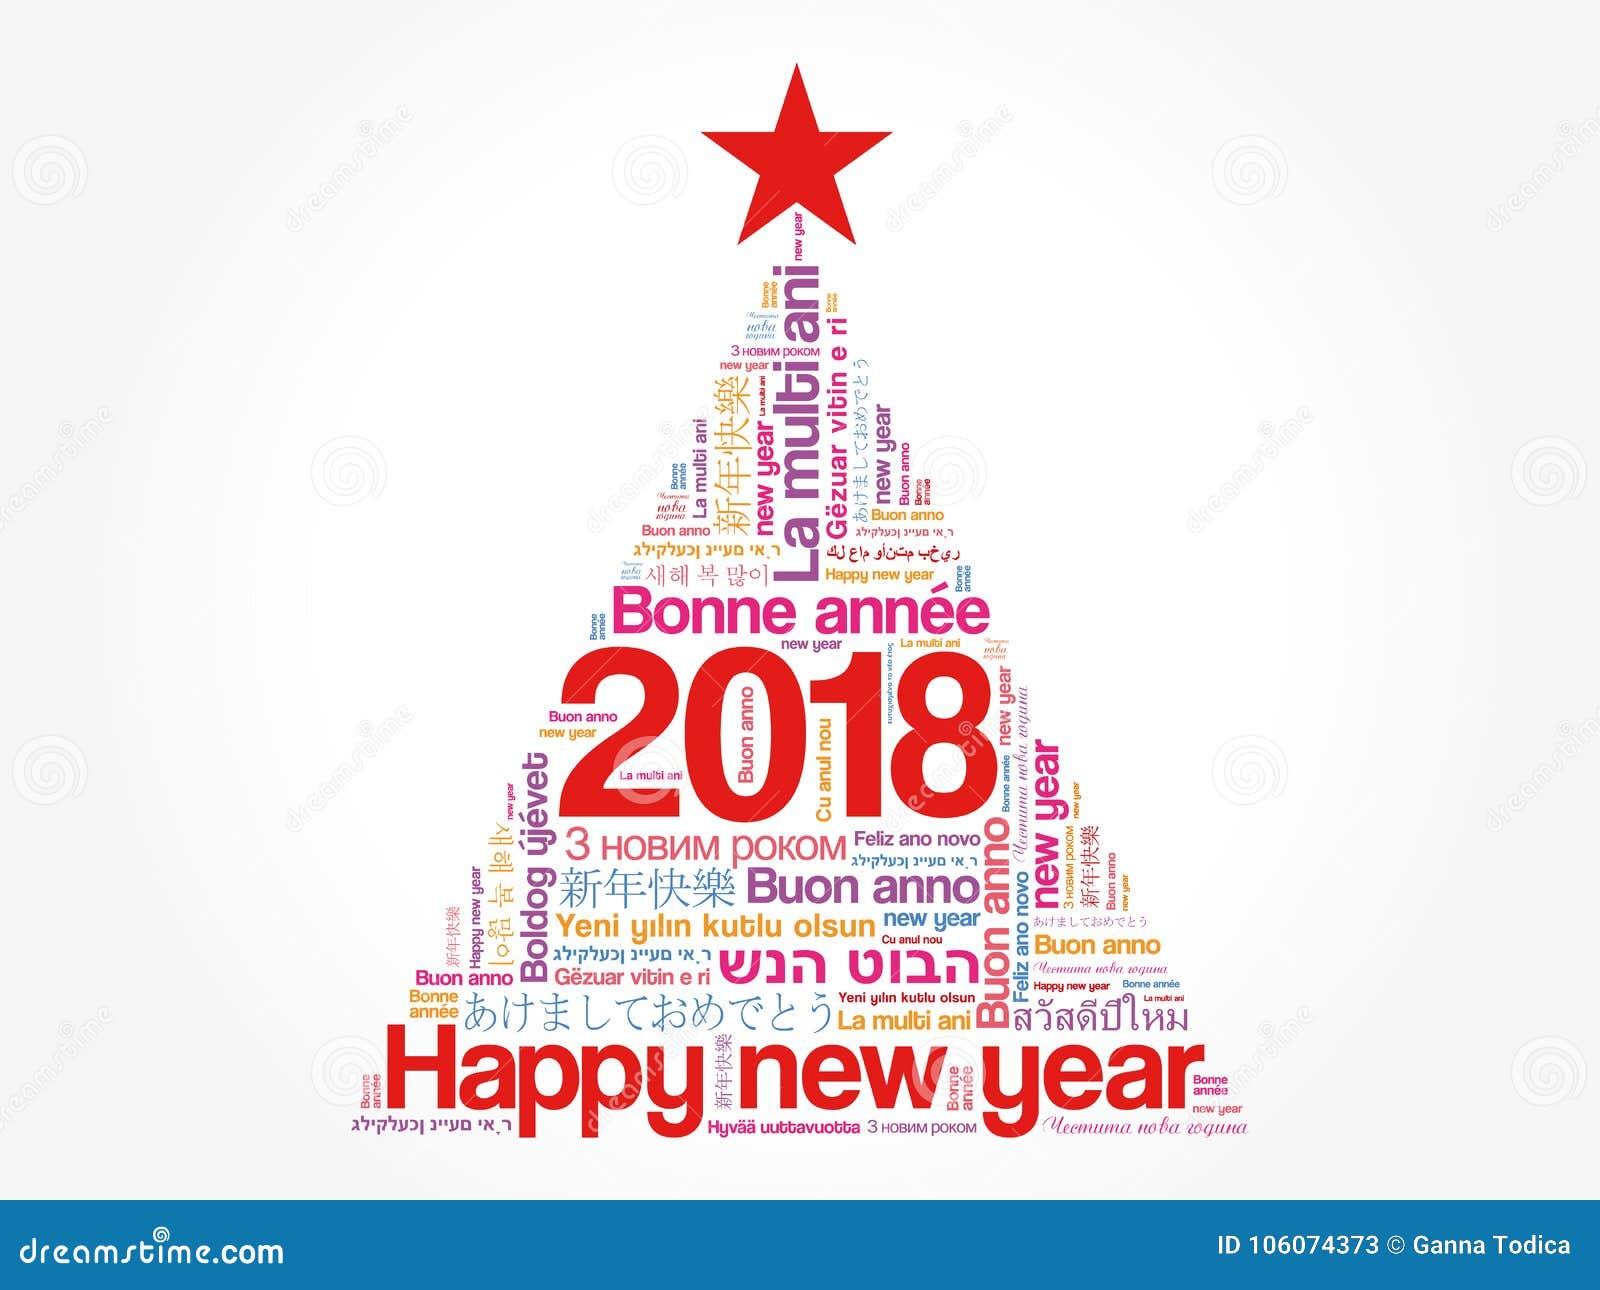 2018 Happy New Year stock illustration. Illustration of 2018 - 106074373